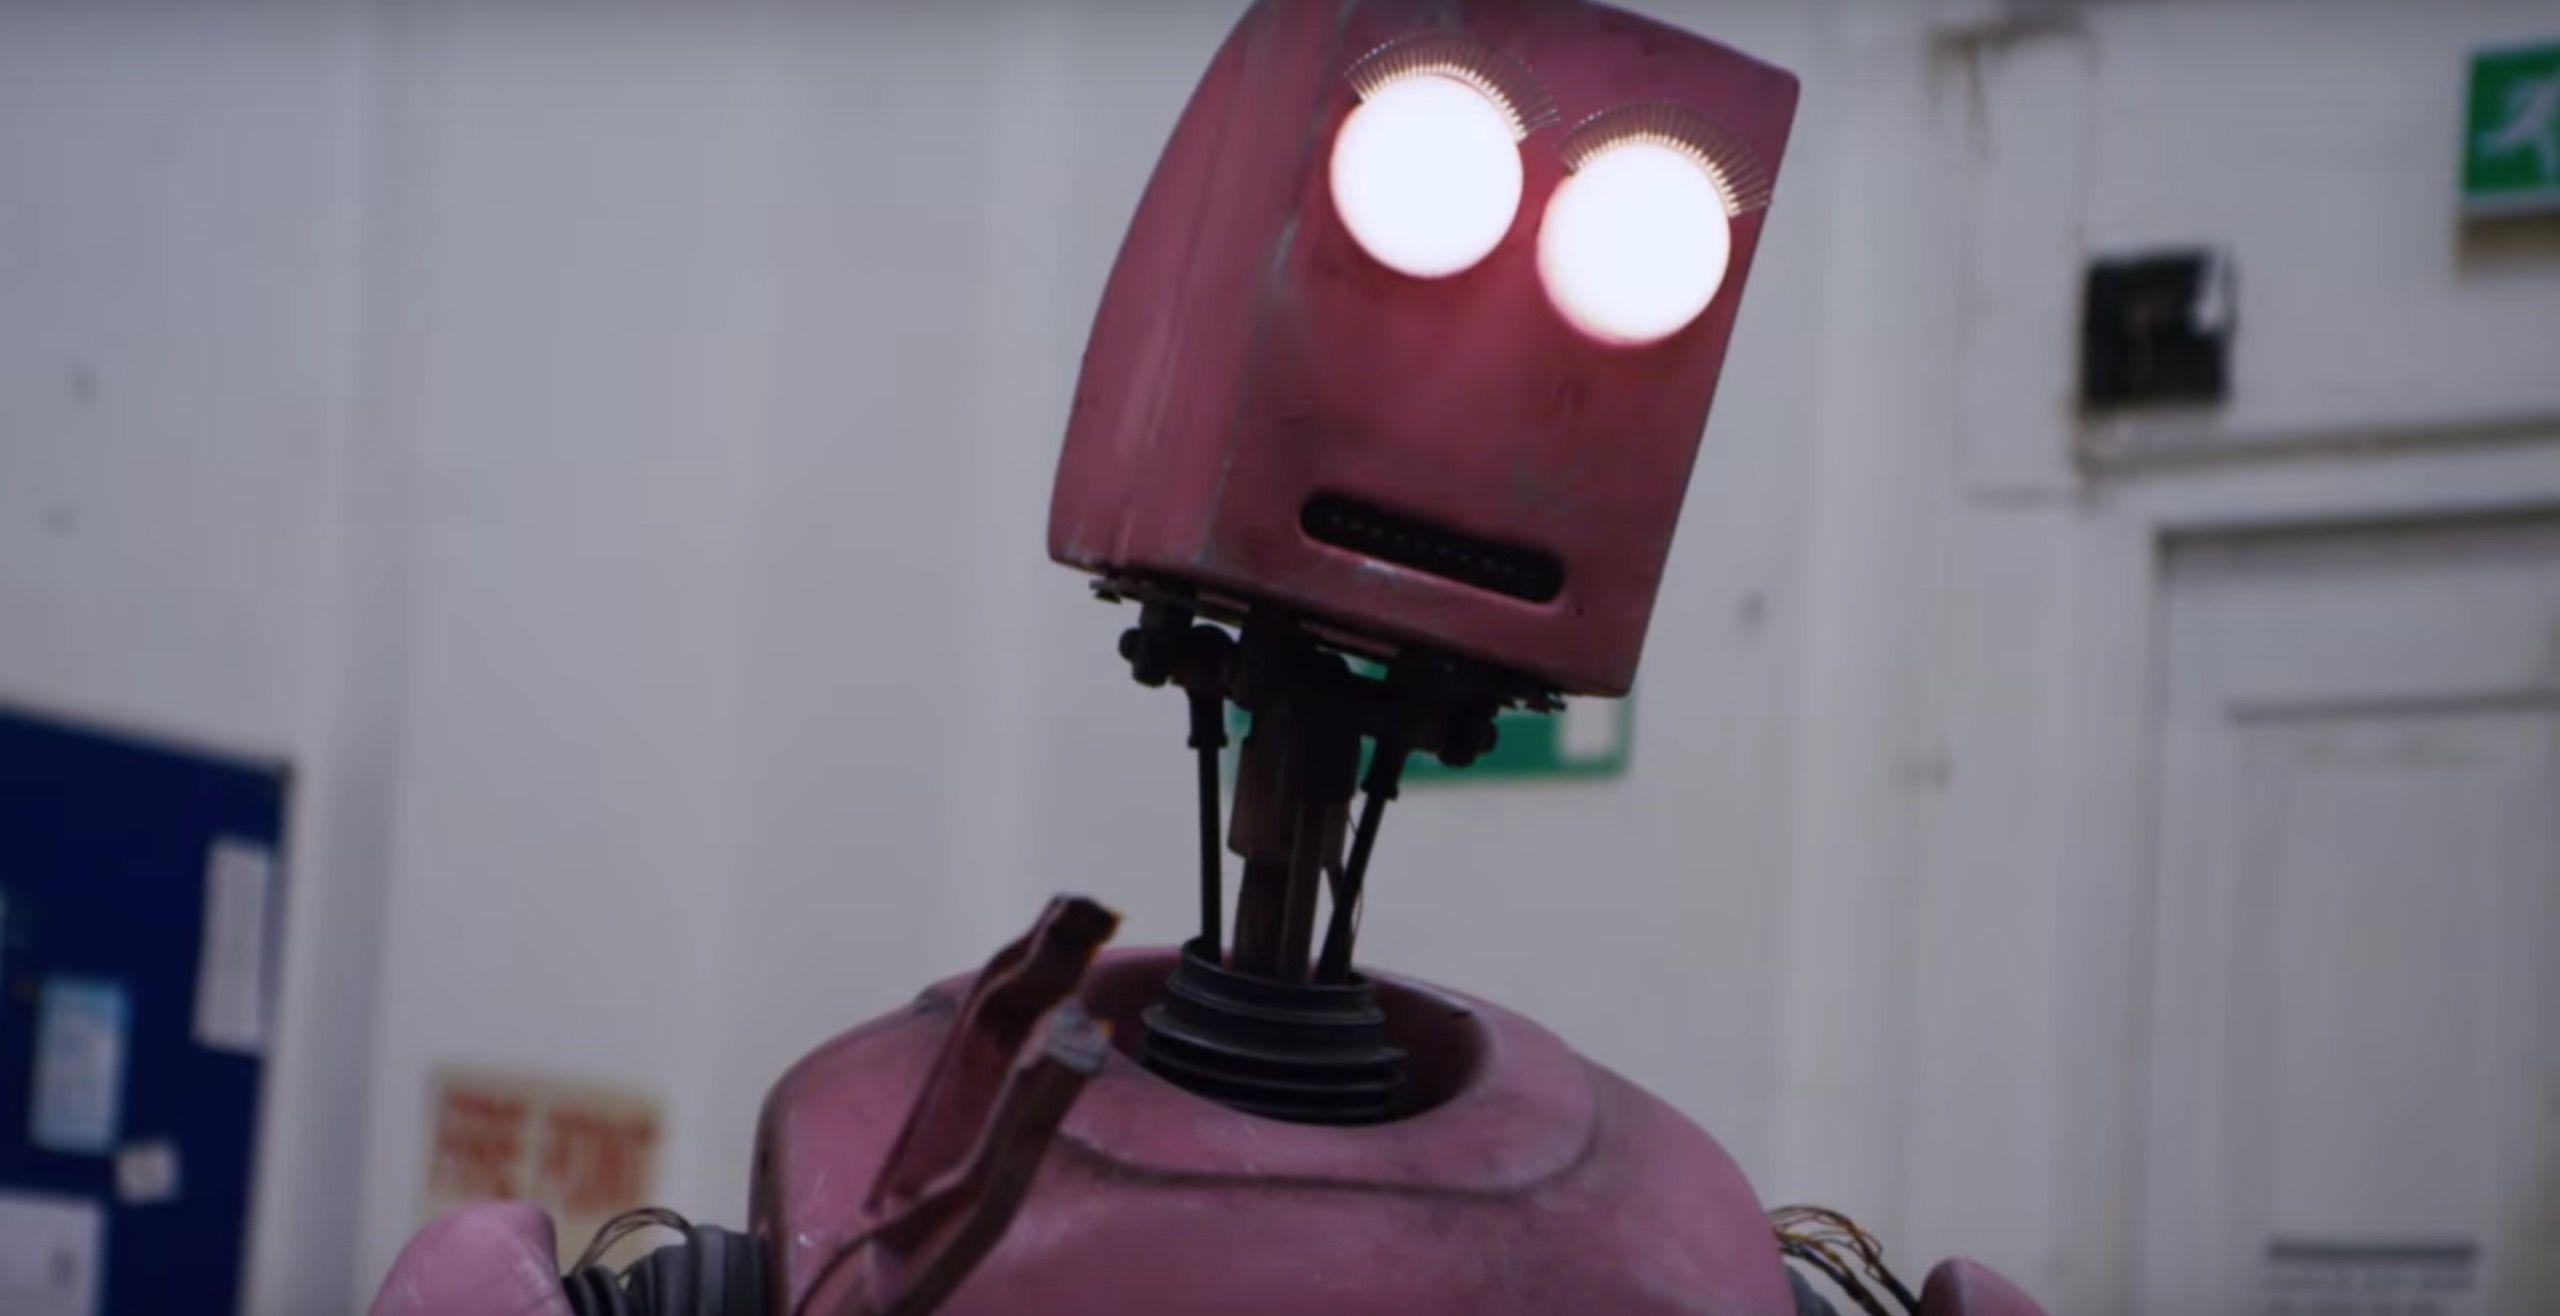 IBM Is Uploading the Weirdest Damn Robot Videos on YouTube